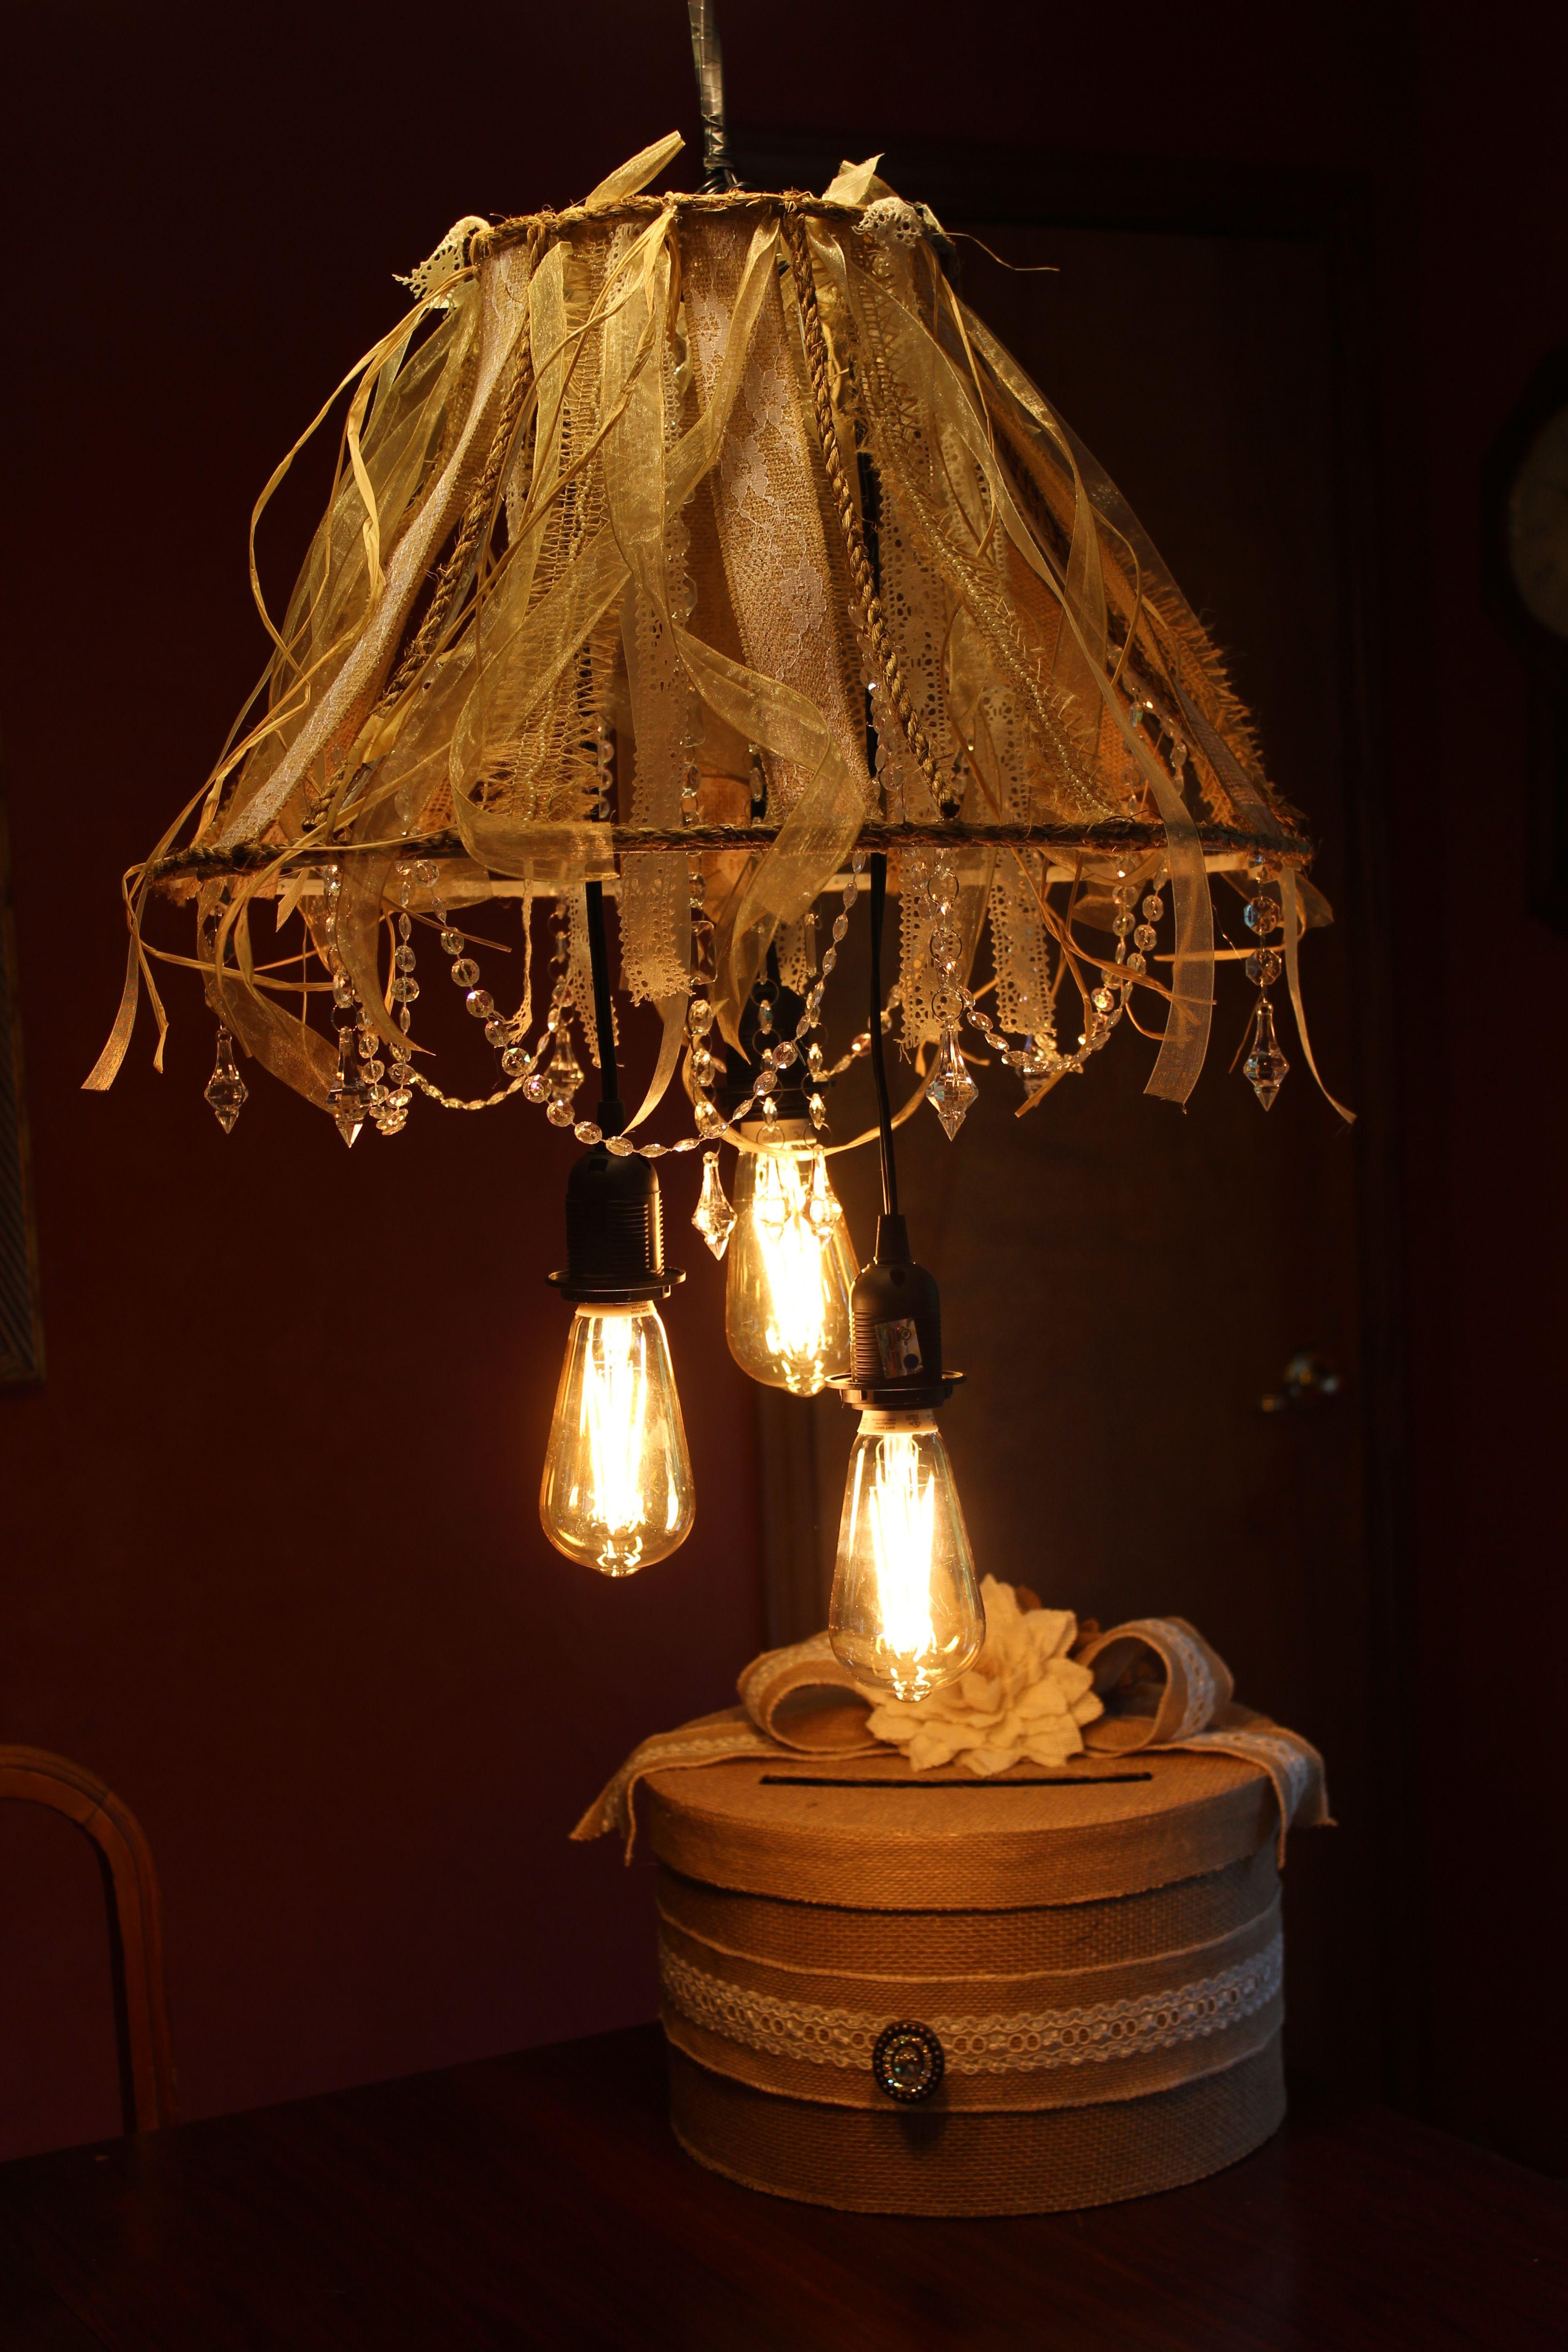 DIY lamp shade shabby chic/rustic chandelier Rustic